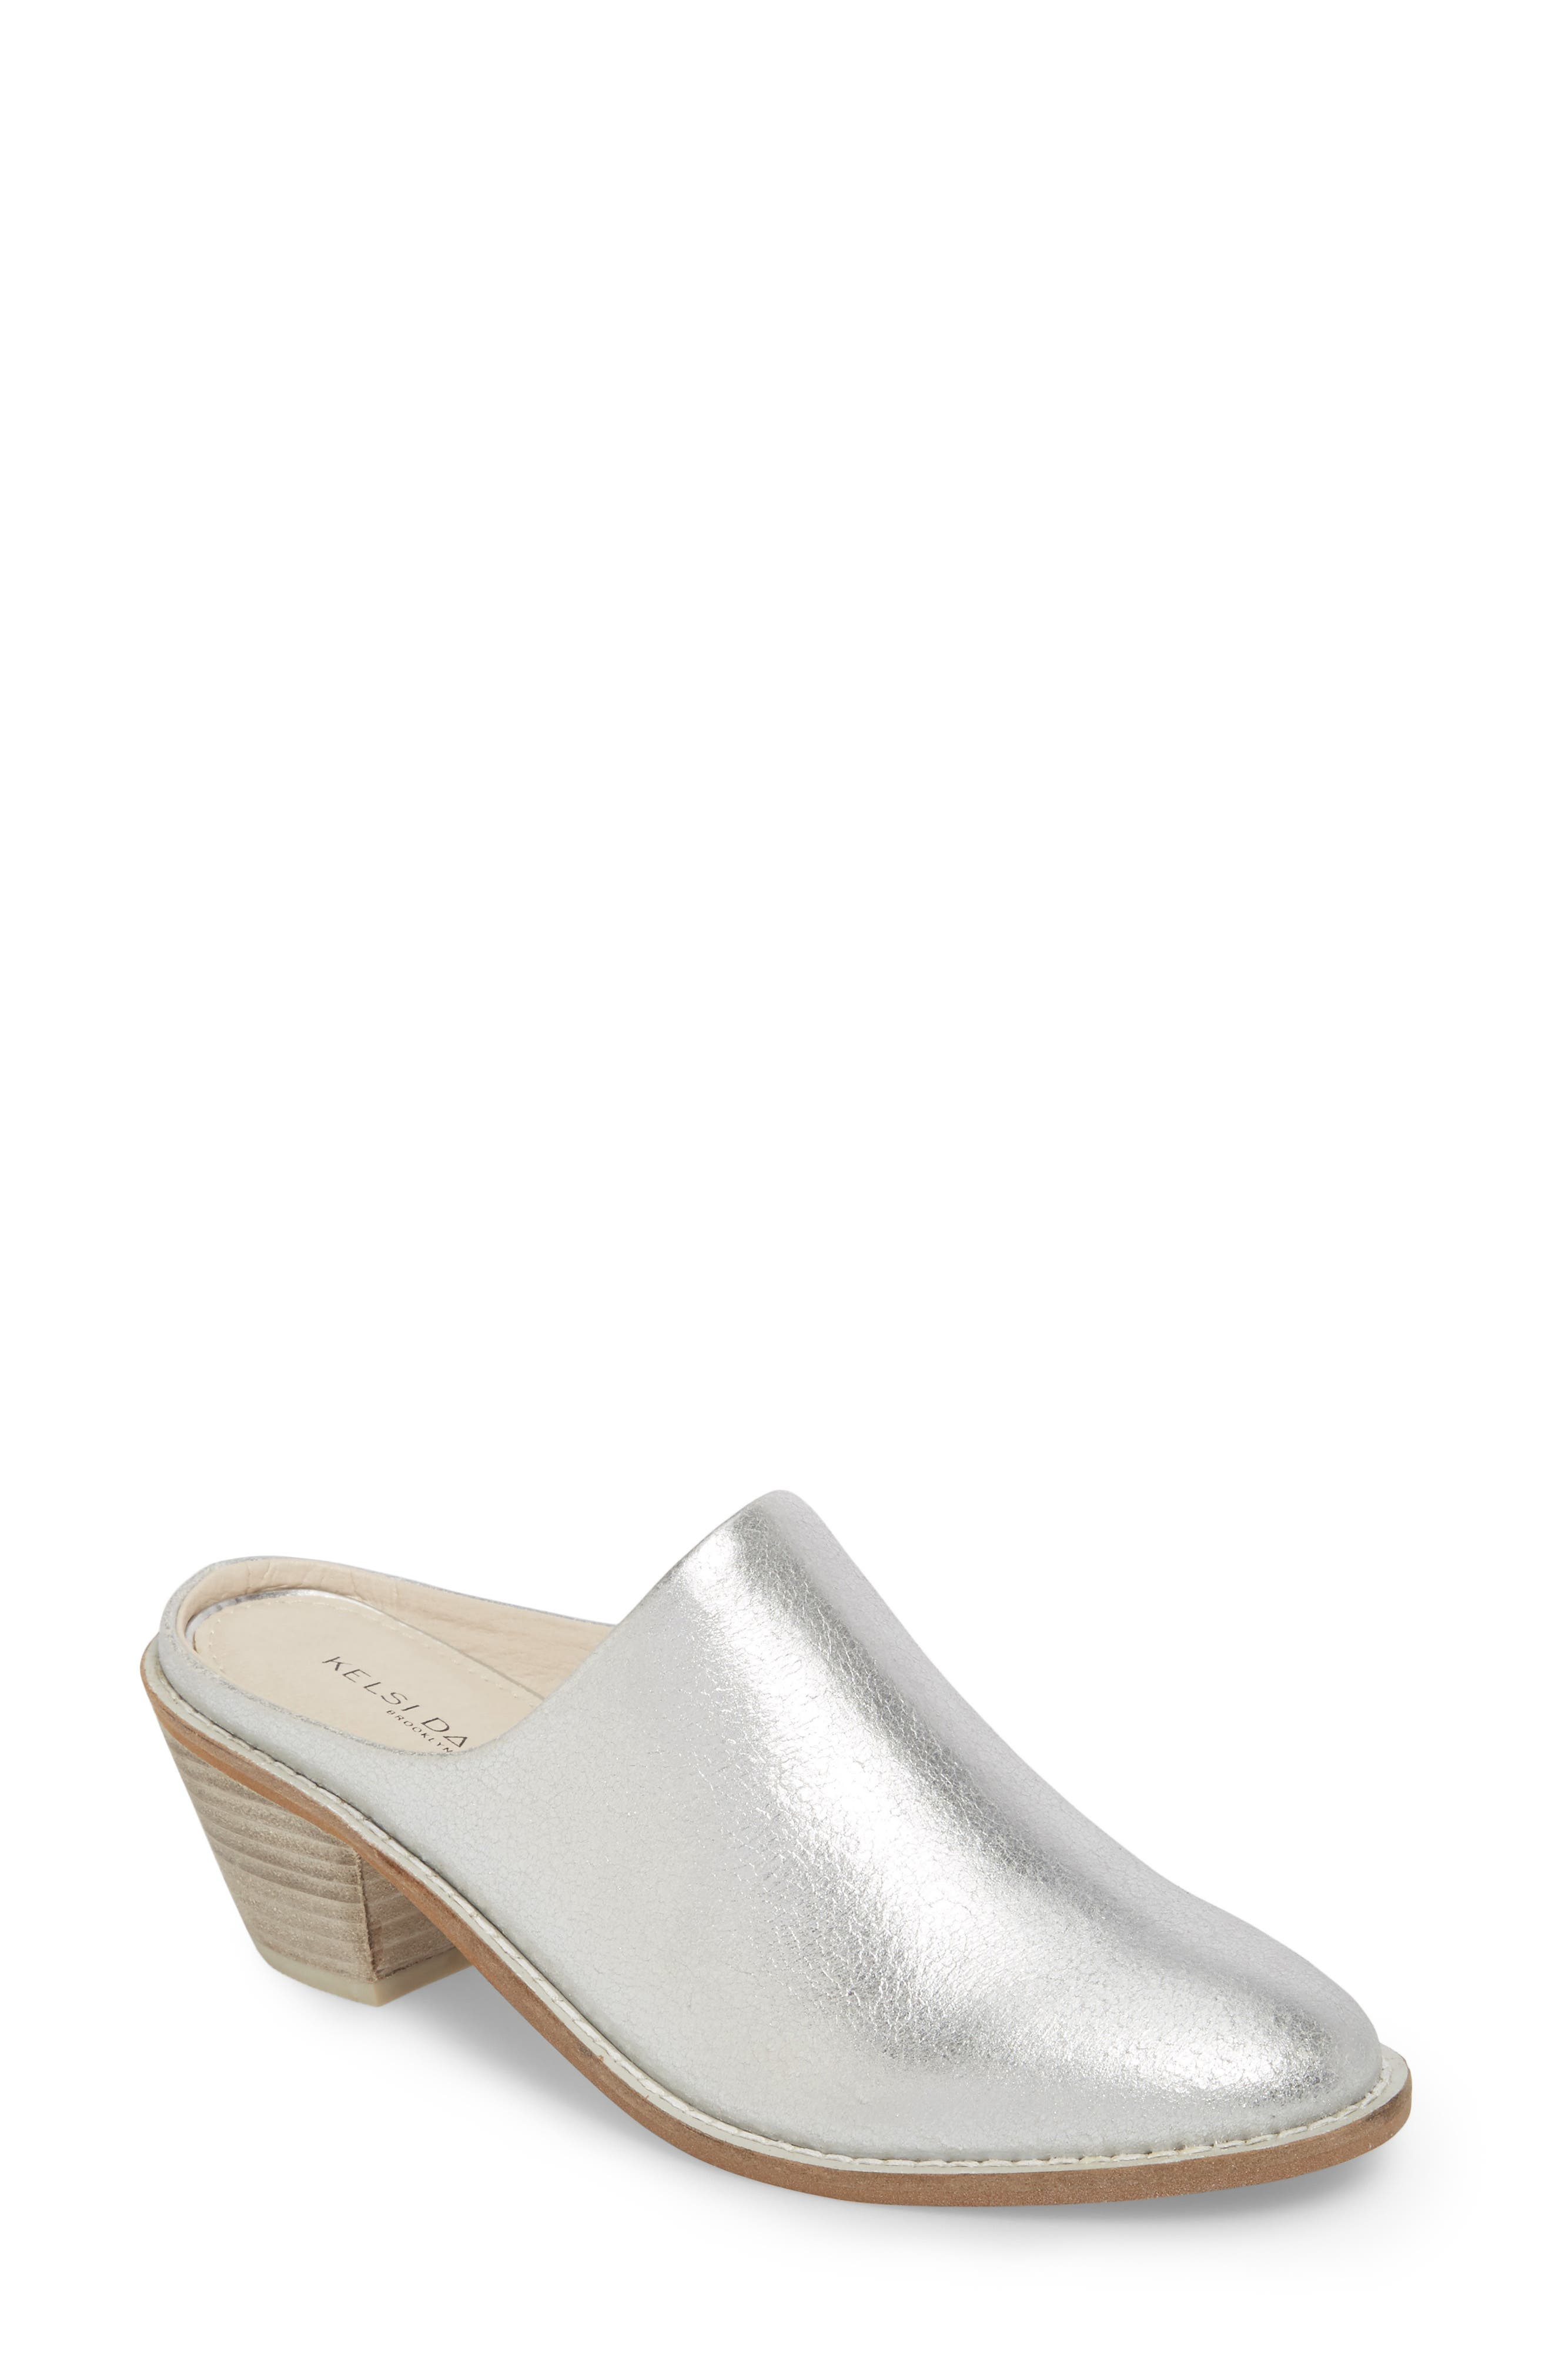 Trend Shoes Store Clackamas